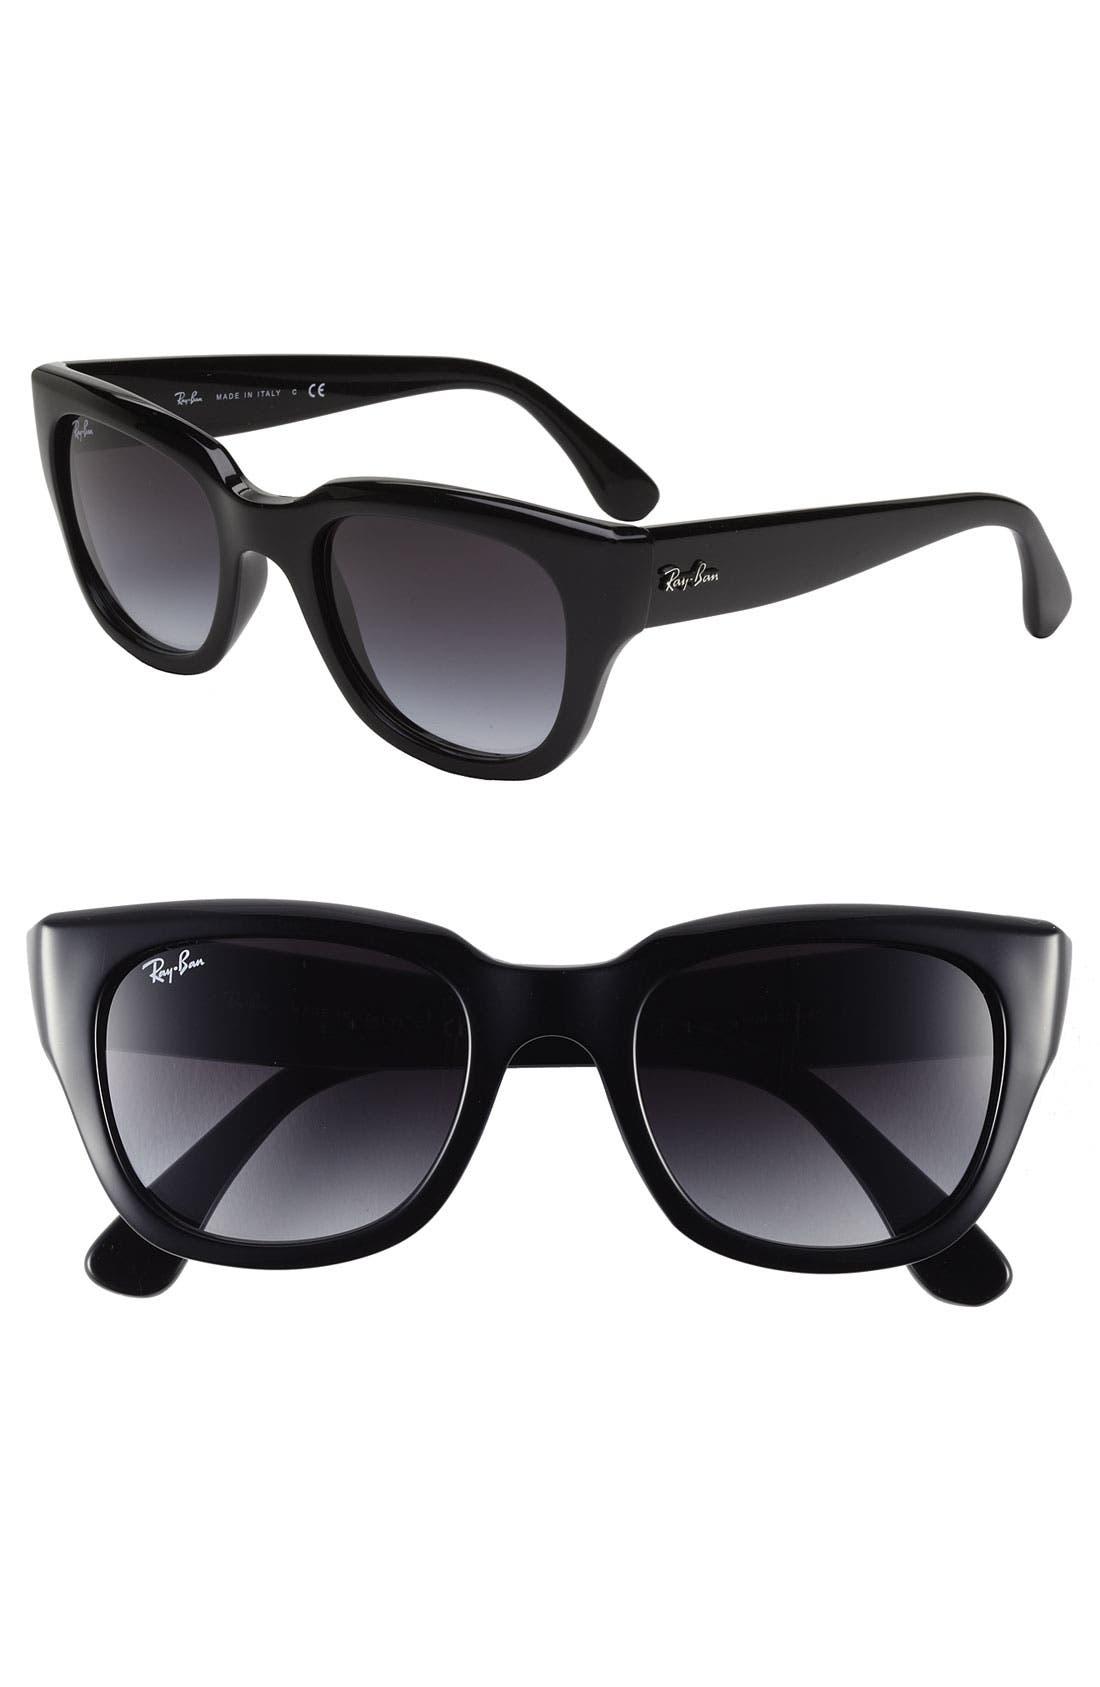 52mm Retro Sunglasses,                         Main,                         color, Black/ Grey Gradient